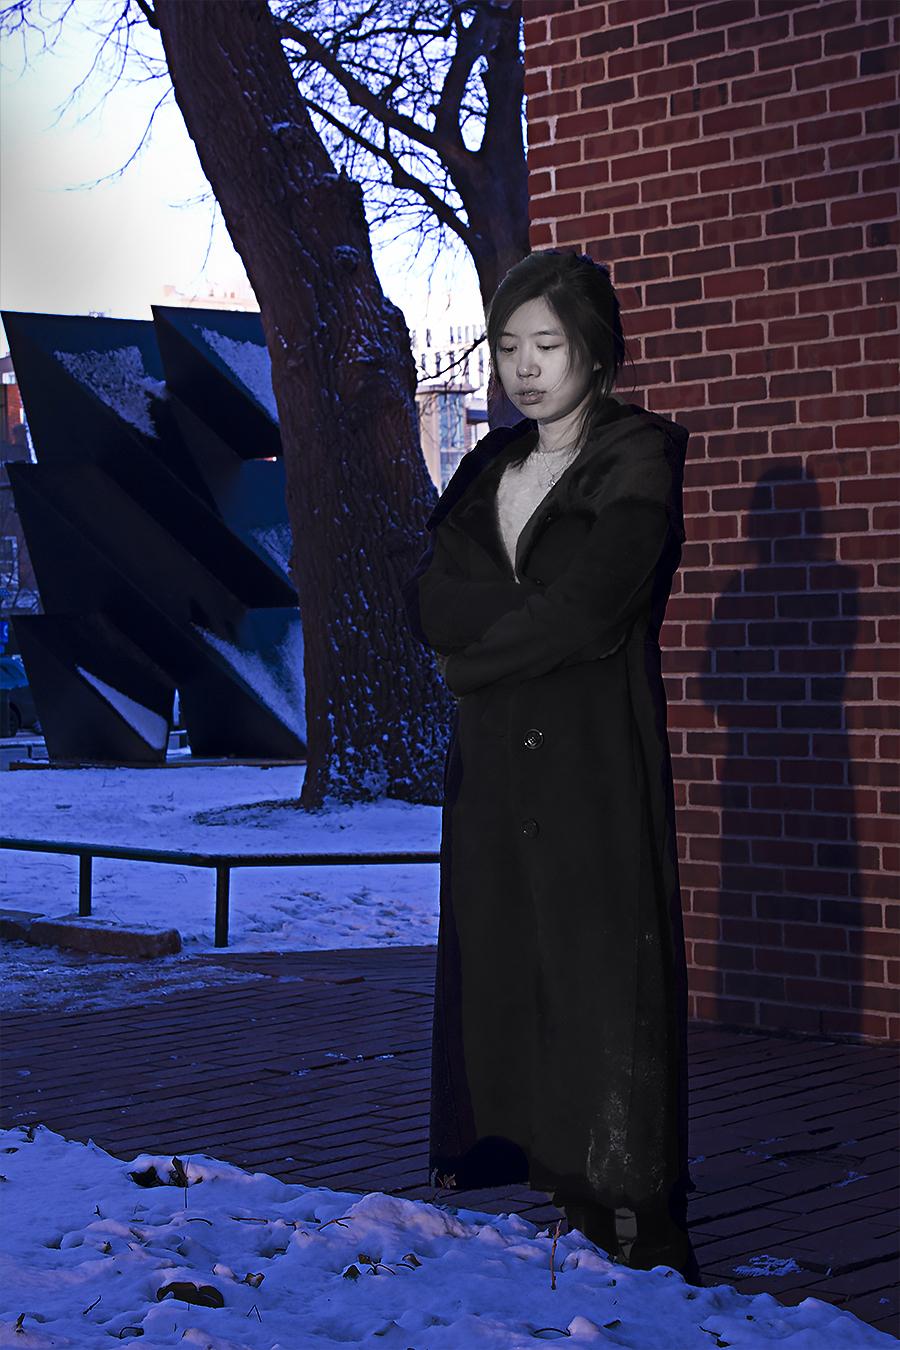 Hong_Li_Photaraphy_Class_Despair_Snowstorm_Portraiture_Feburary_9_2017_Location_Meyerson_Hall_School_Of_Design